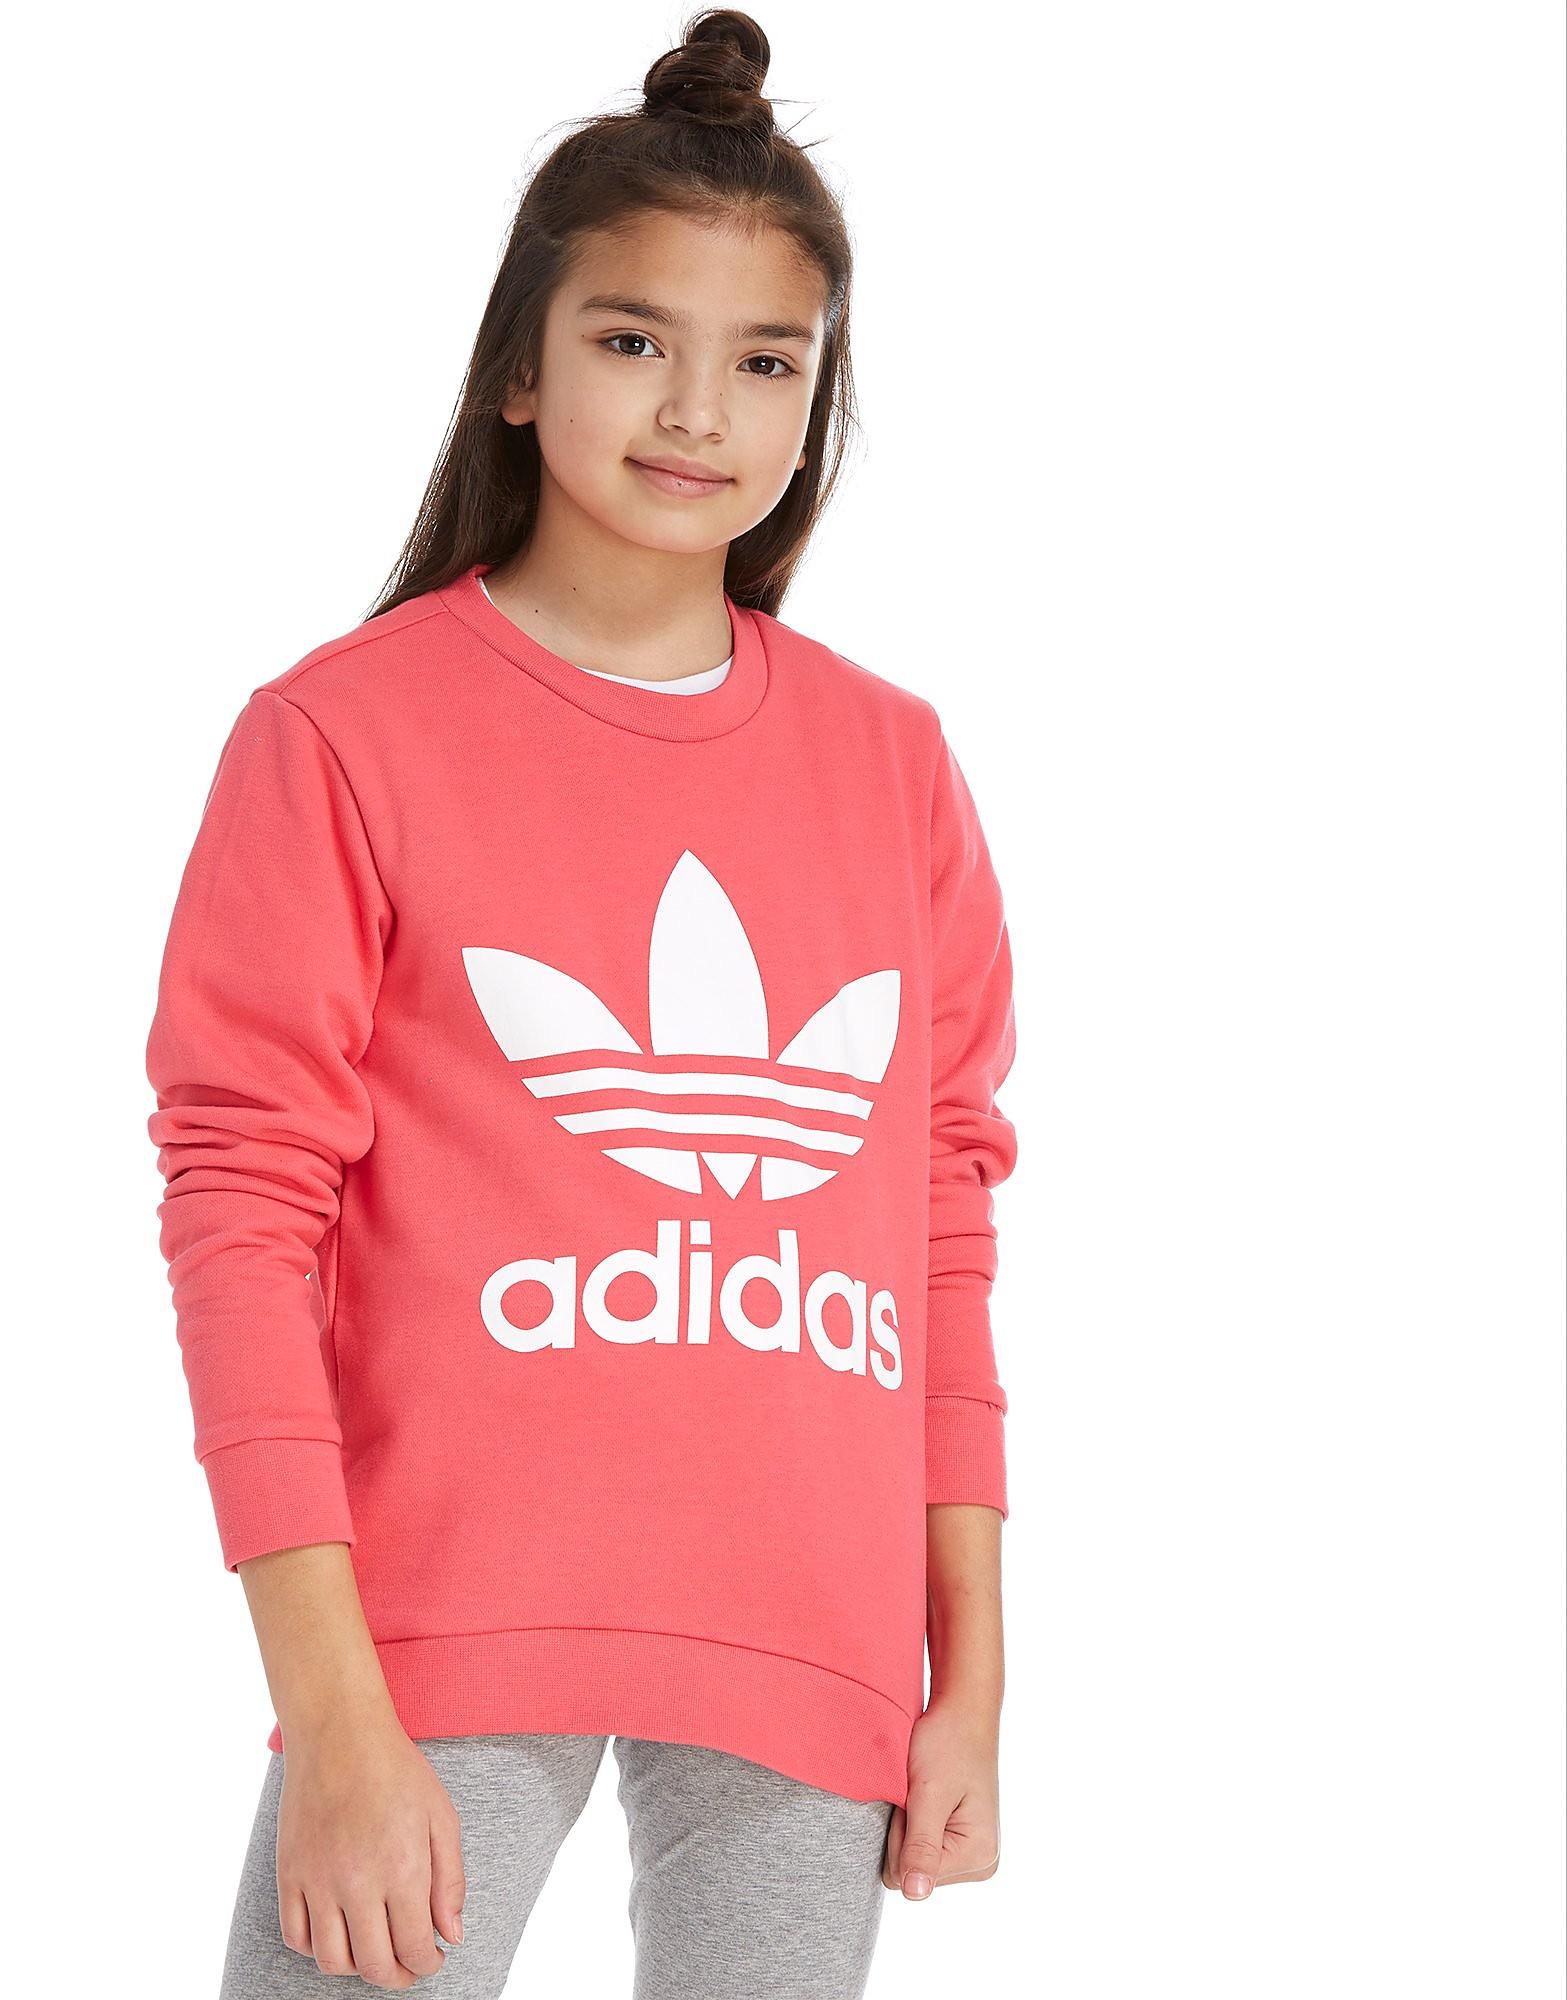 adidas Originals Girls' Crew Sweatshirt Junior